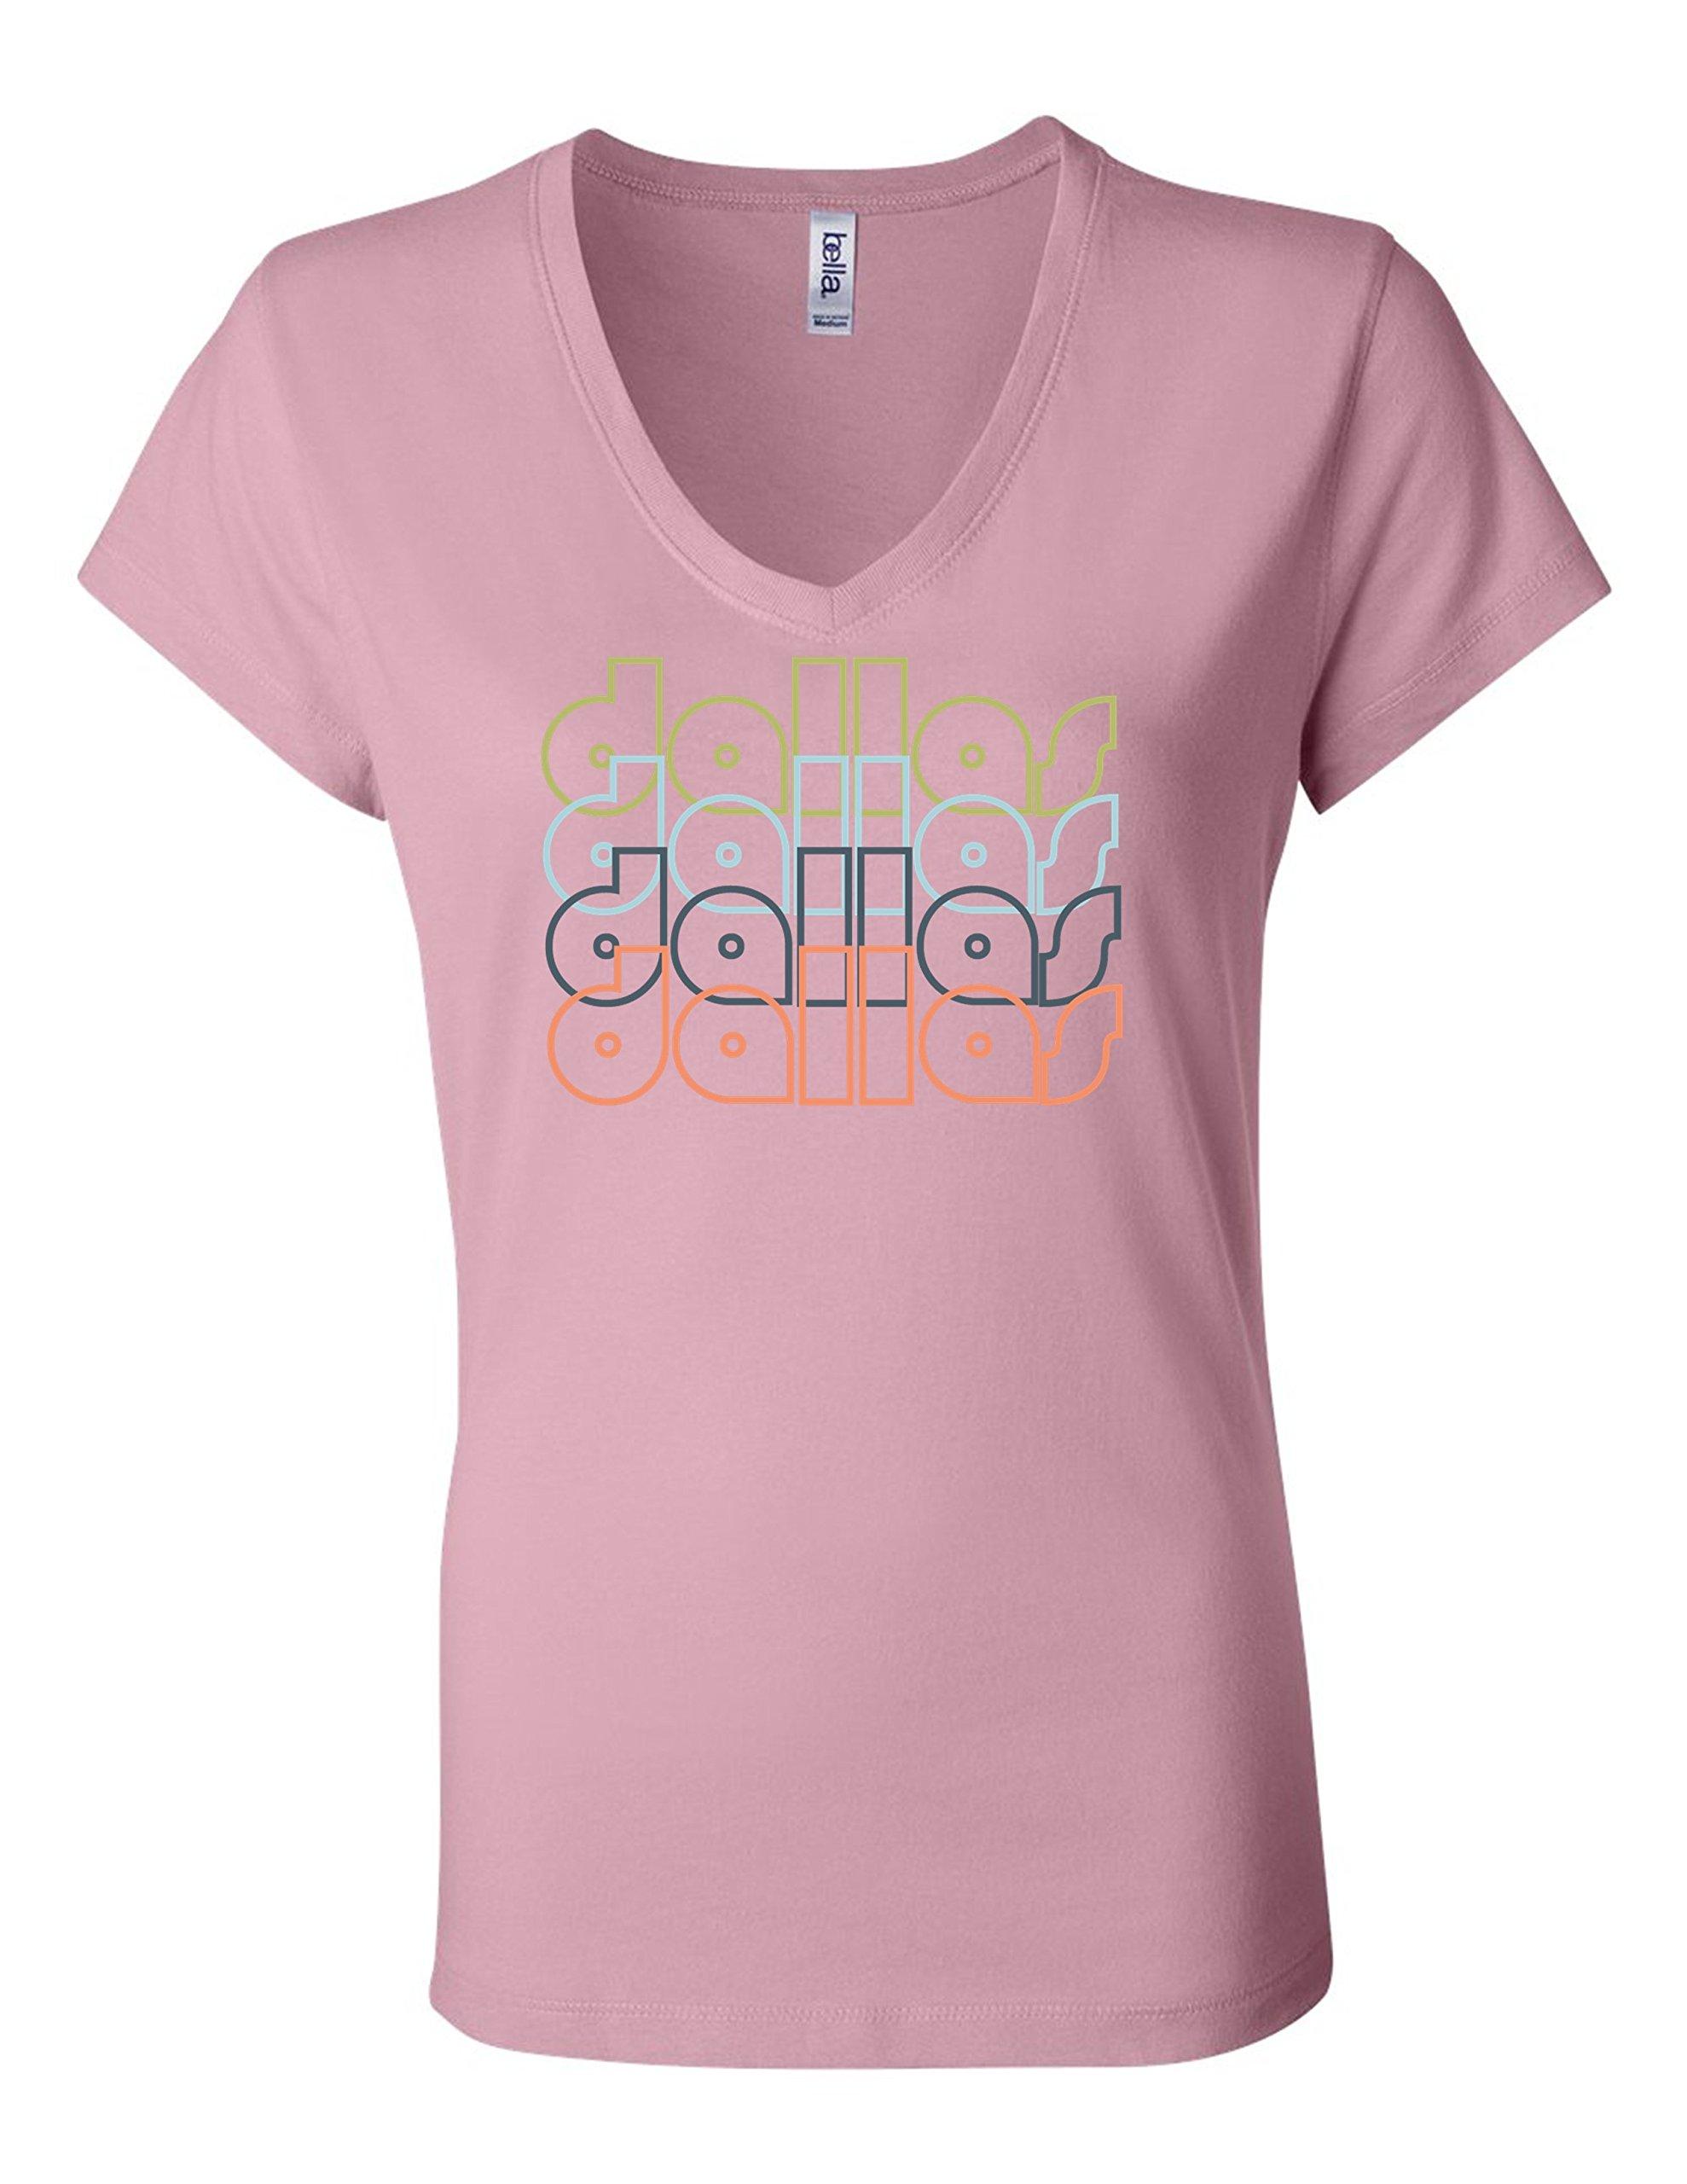 Dallas Texas Retro 6005 Premium T Shirt Humorous T 8991